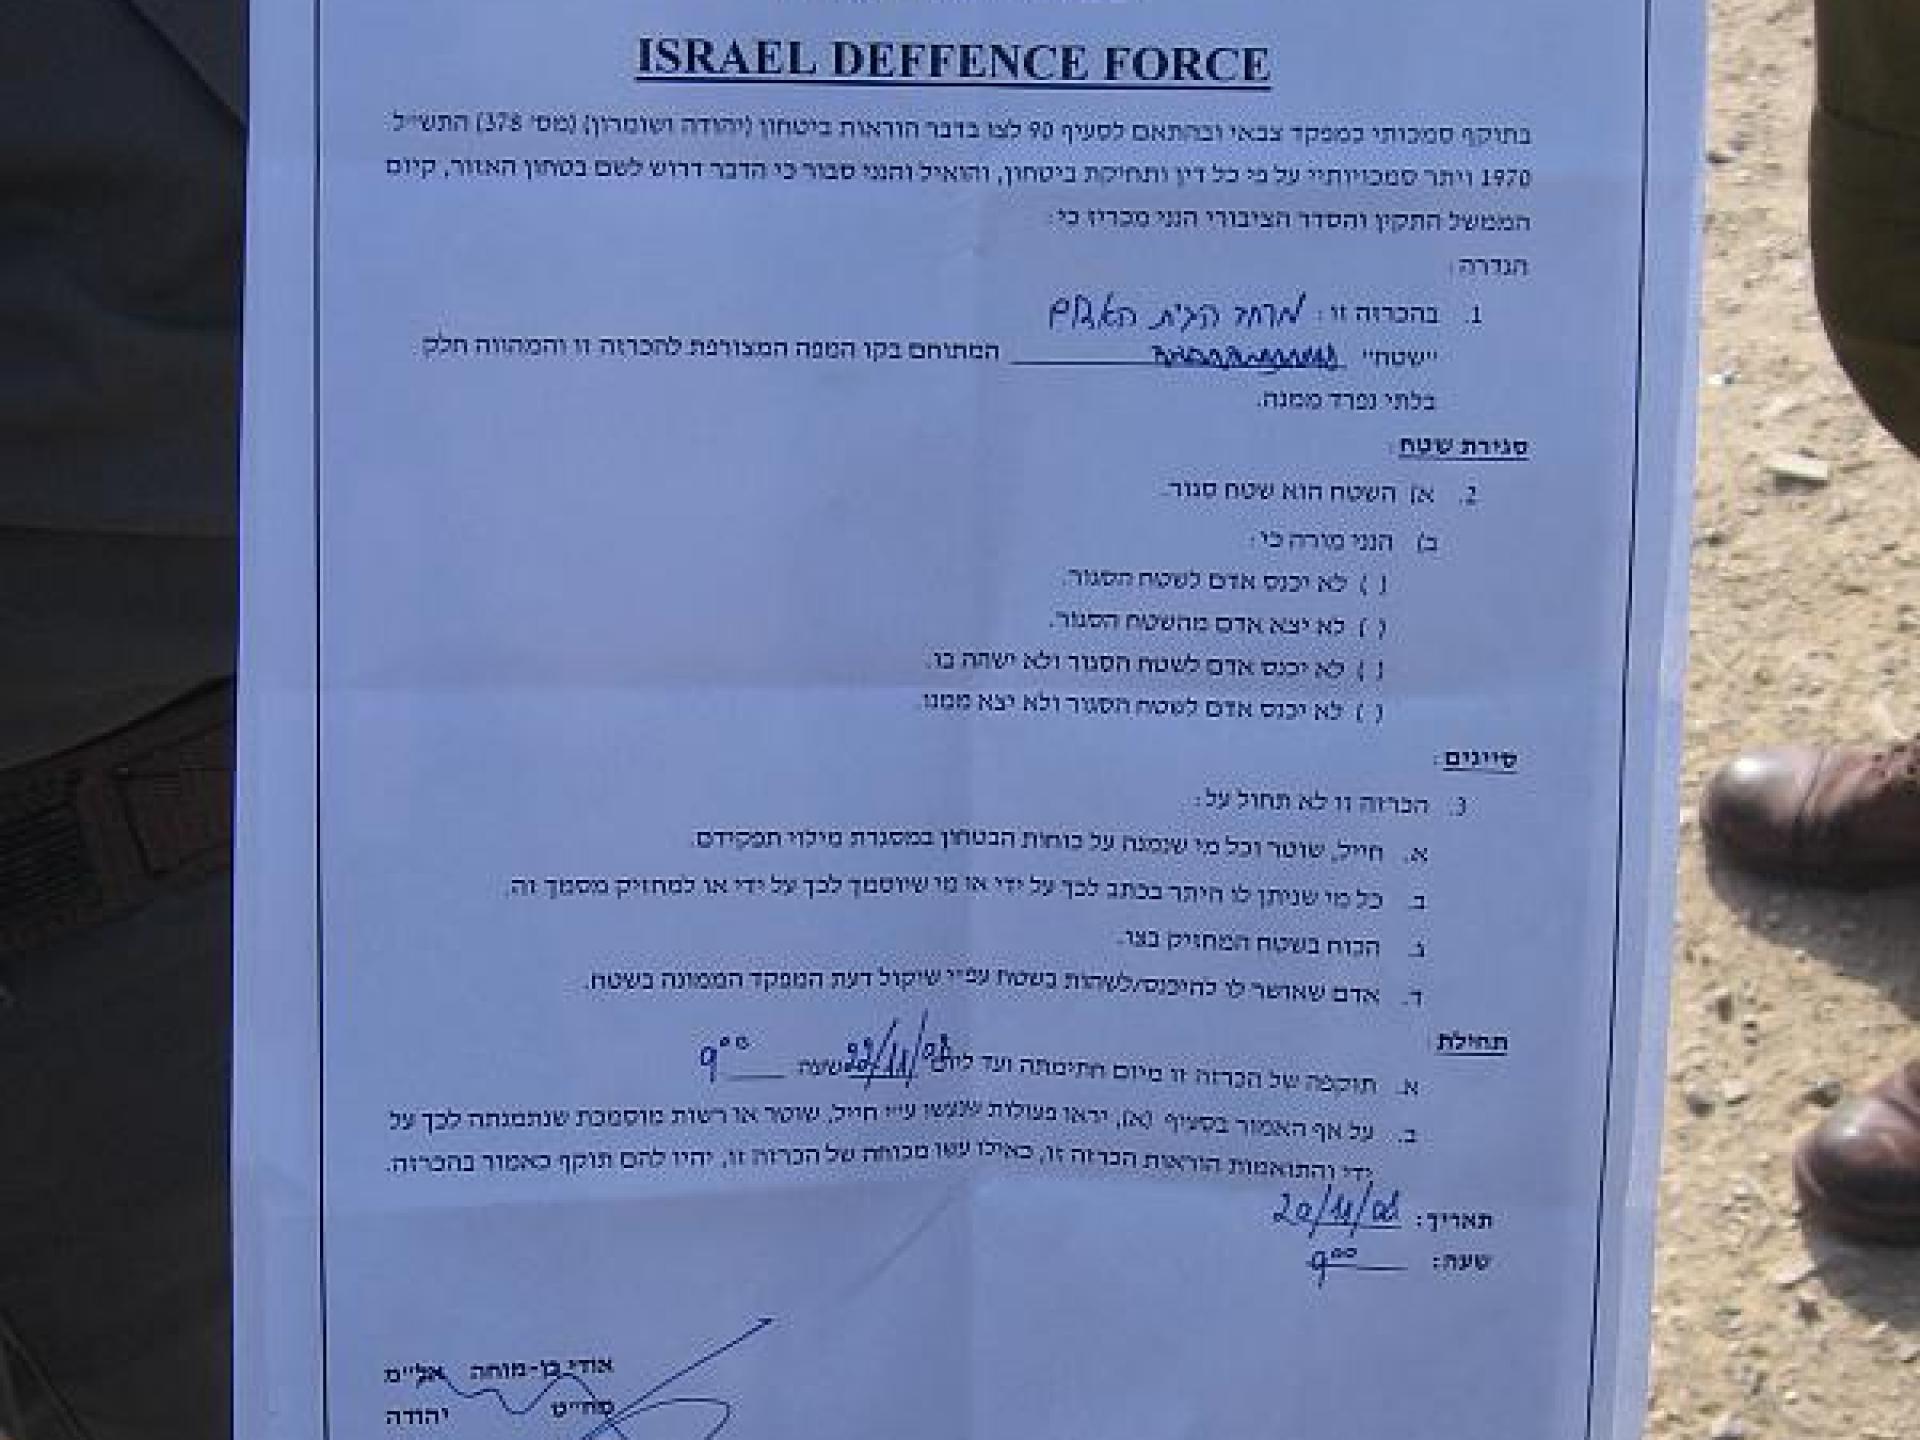 Hebron 20.11.08